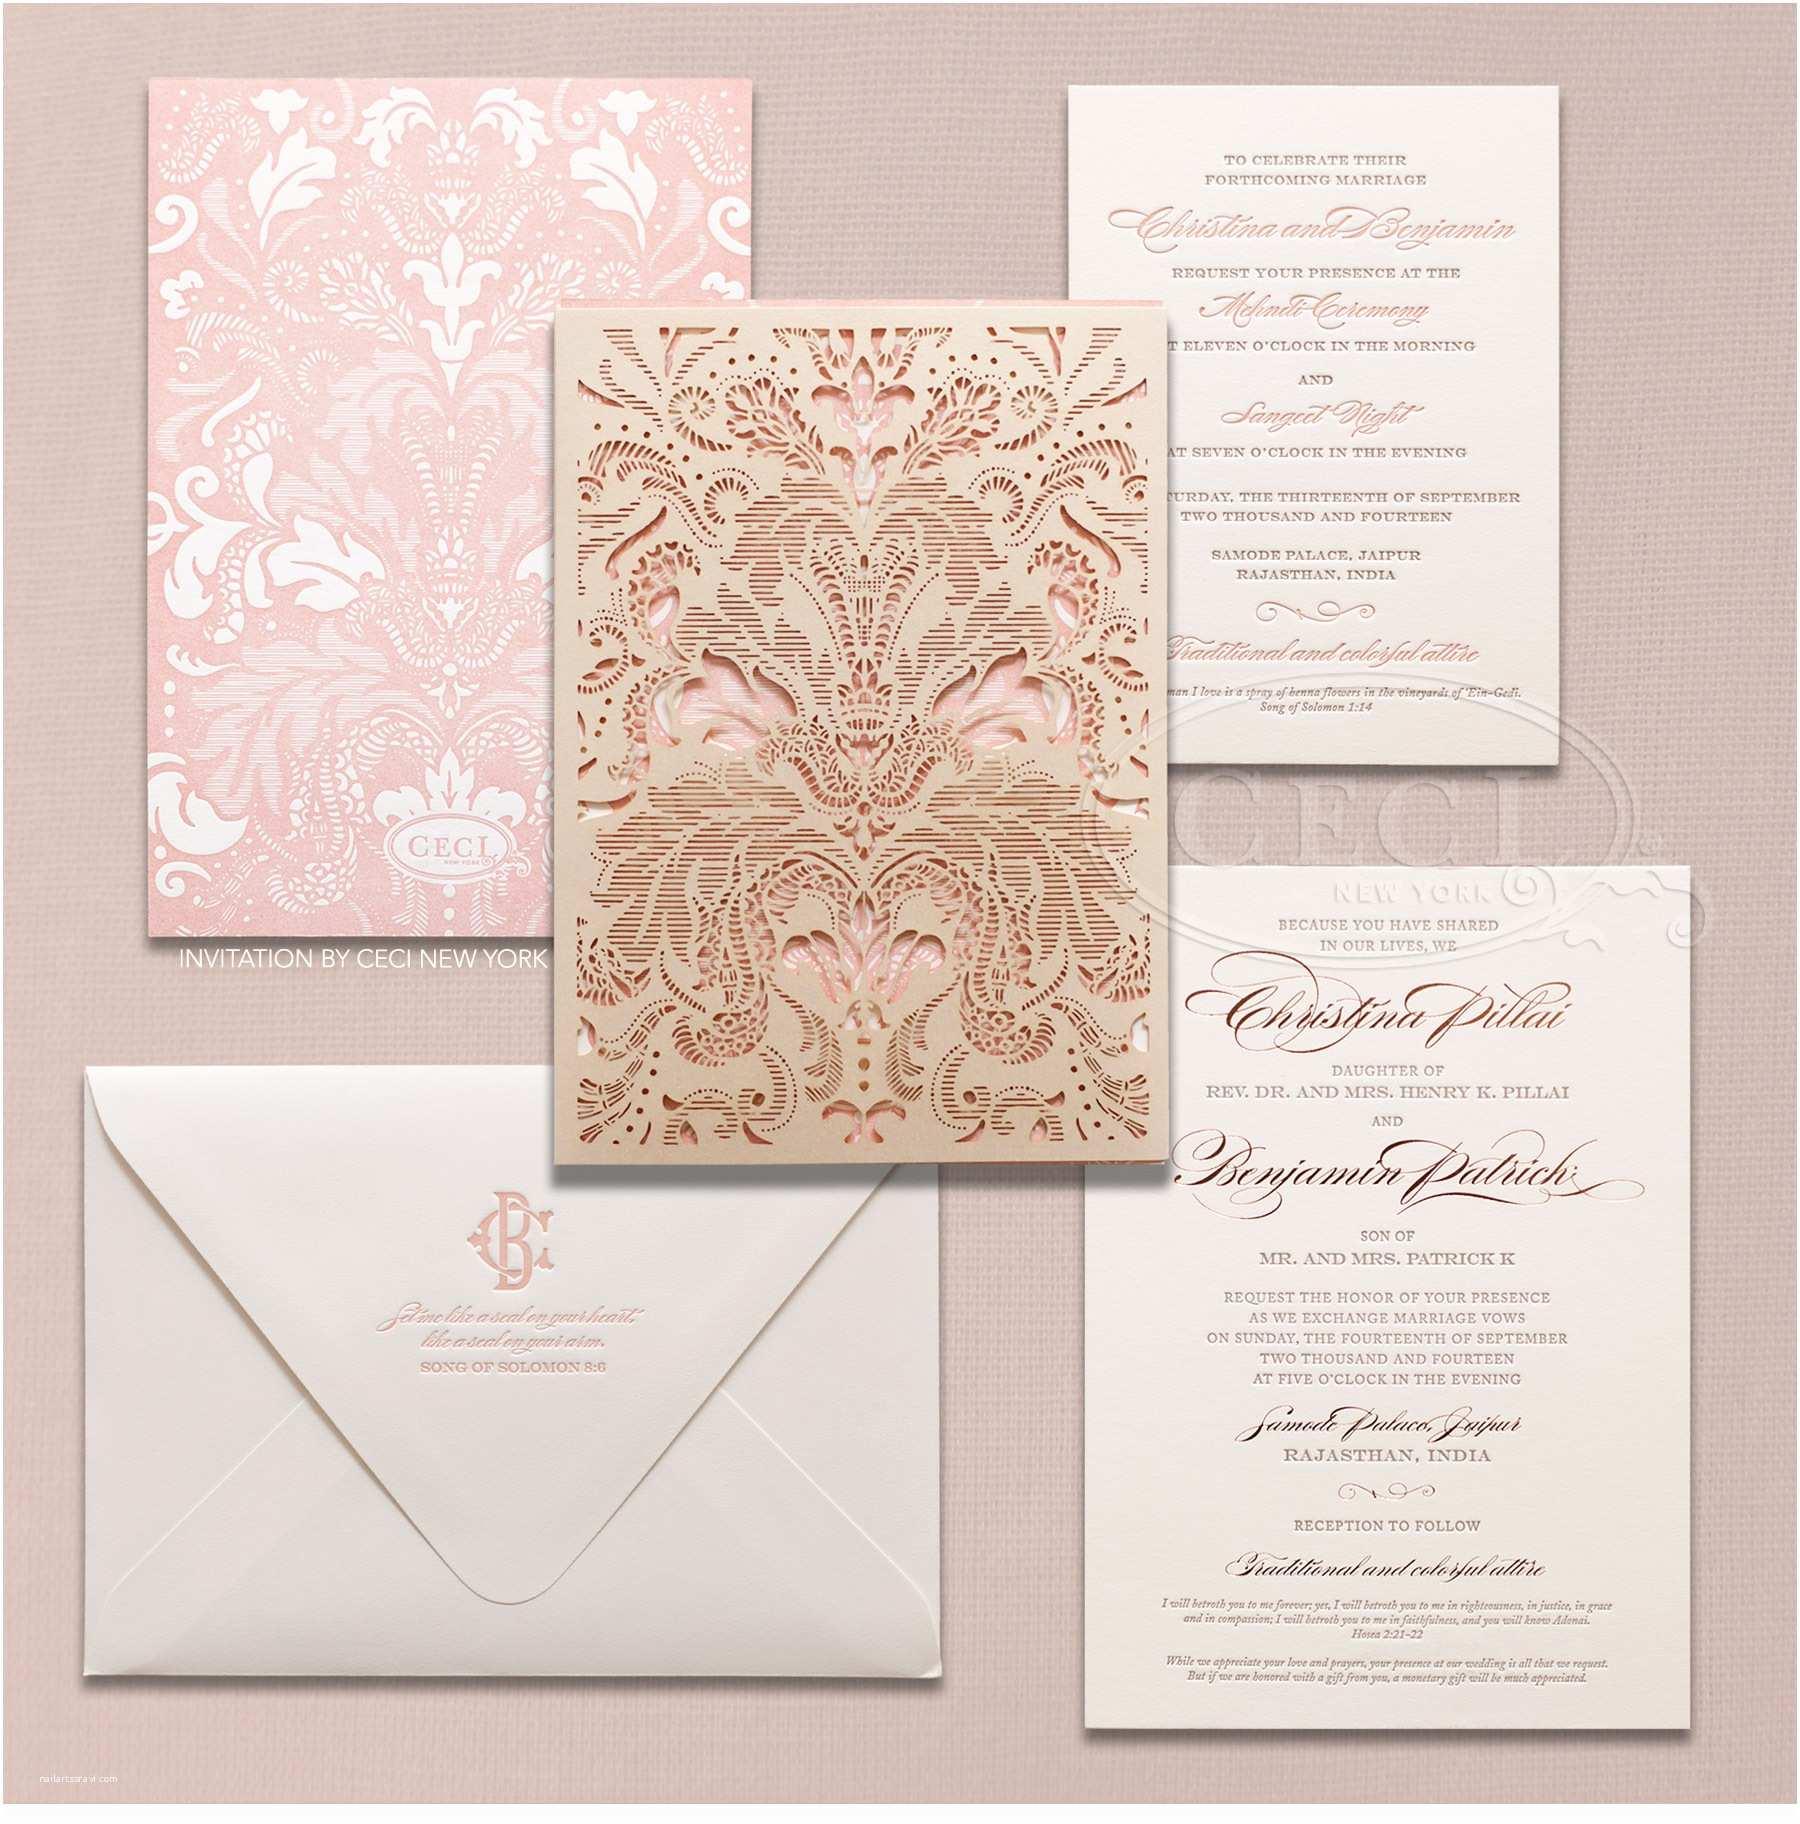 Indian Wedding Invitations Luxury Wedding Invitations for Elegance Registaz